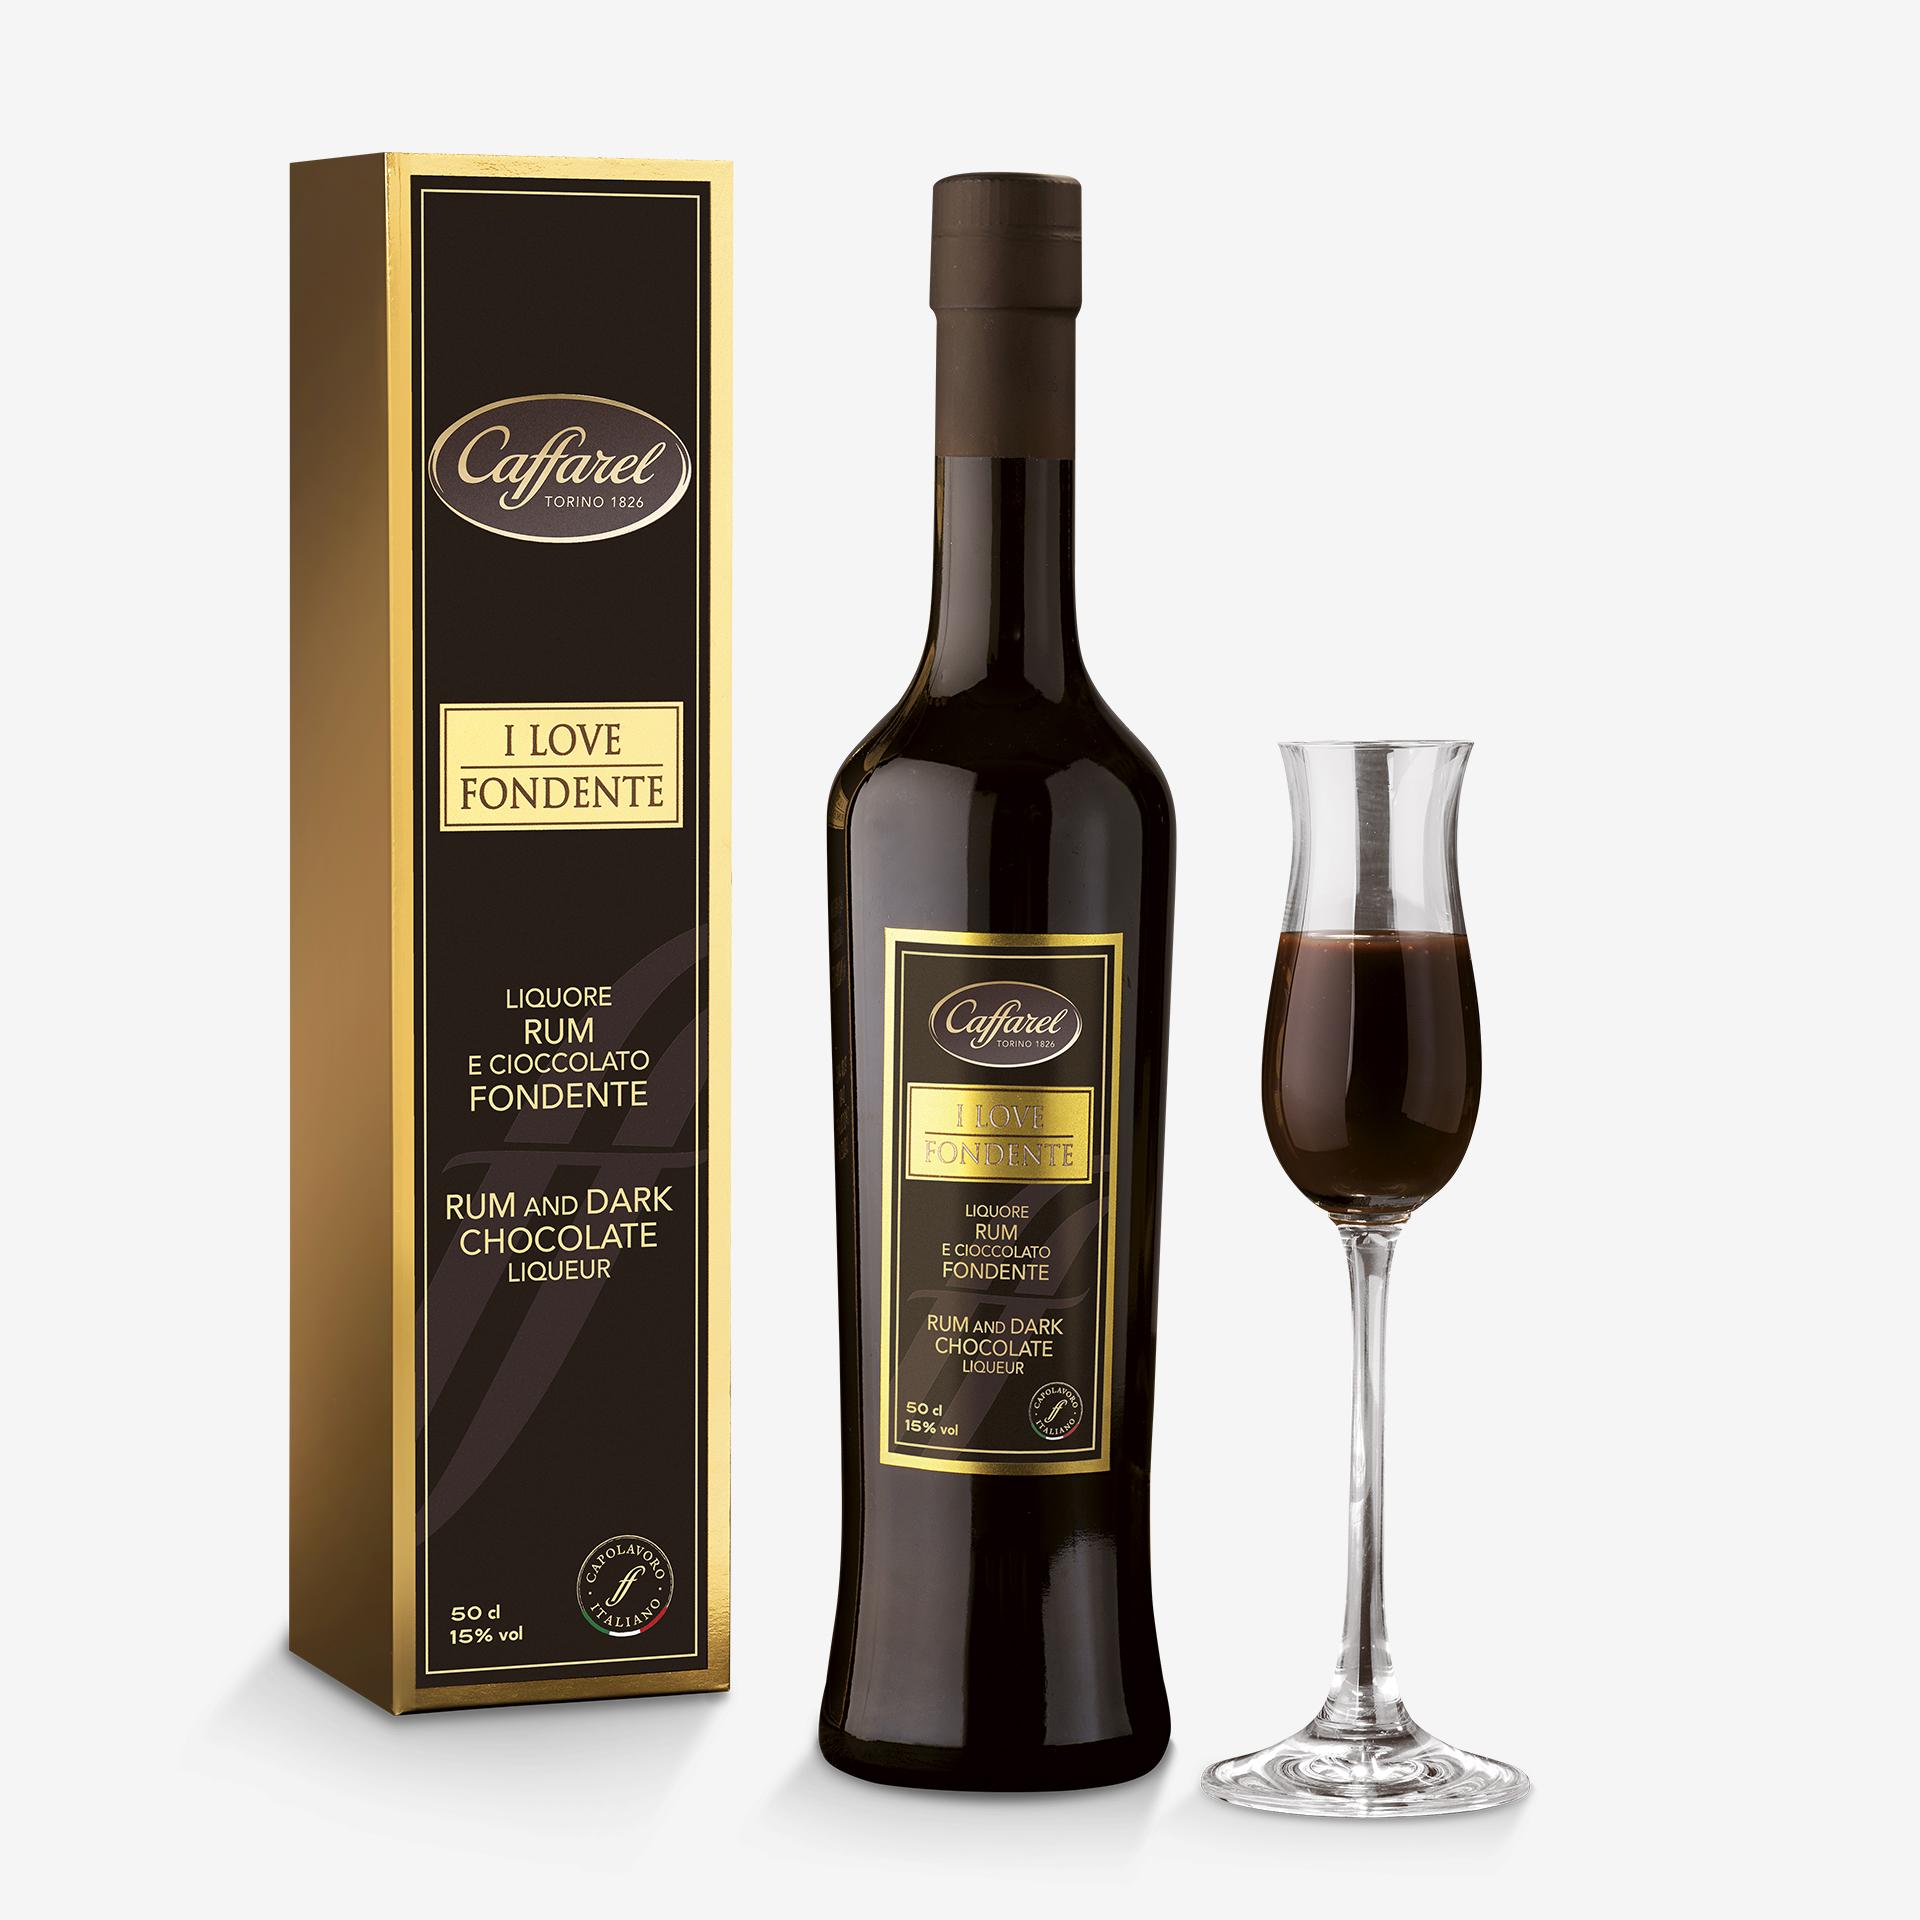 I Love Fondente: Rum and dark chocolate Liqueur